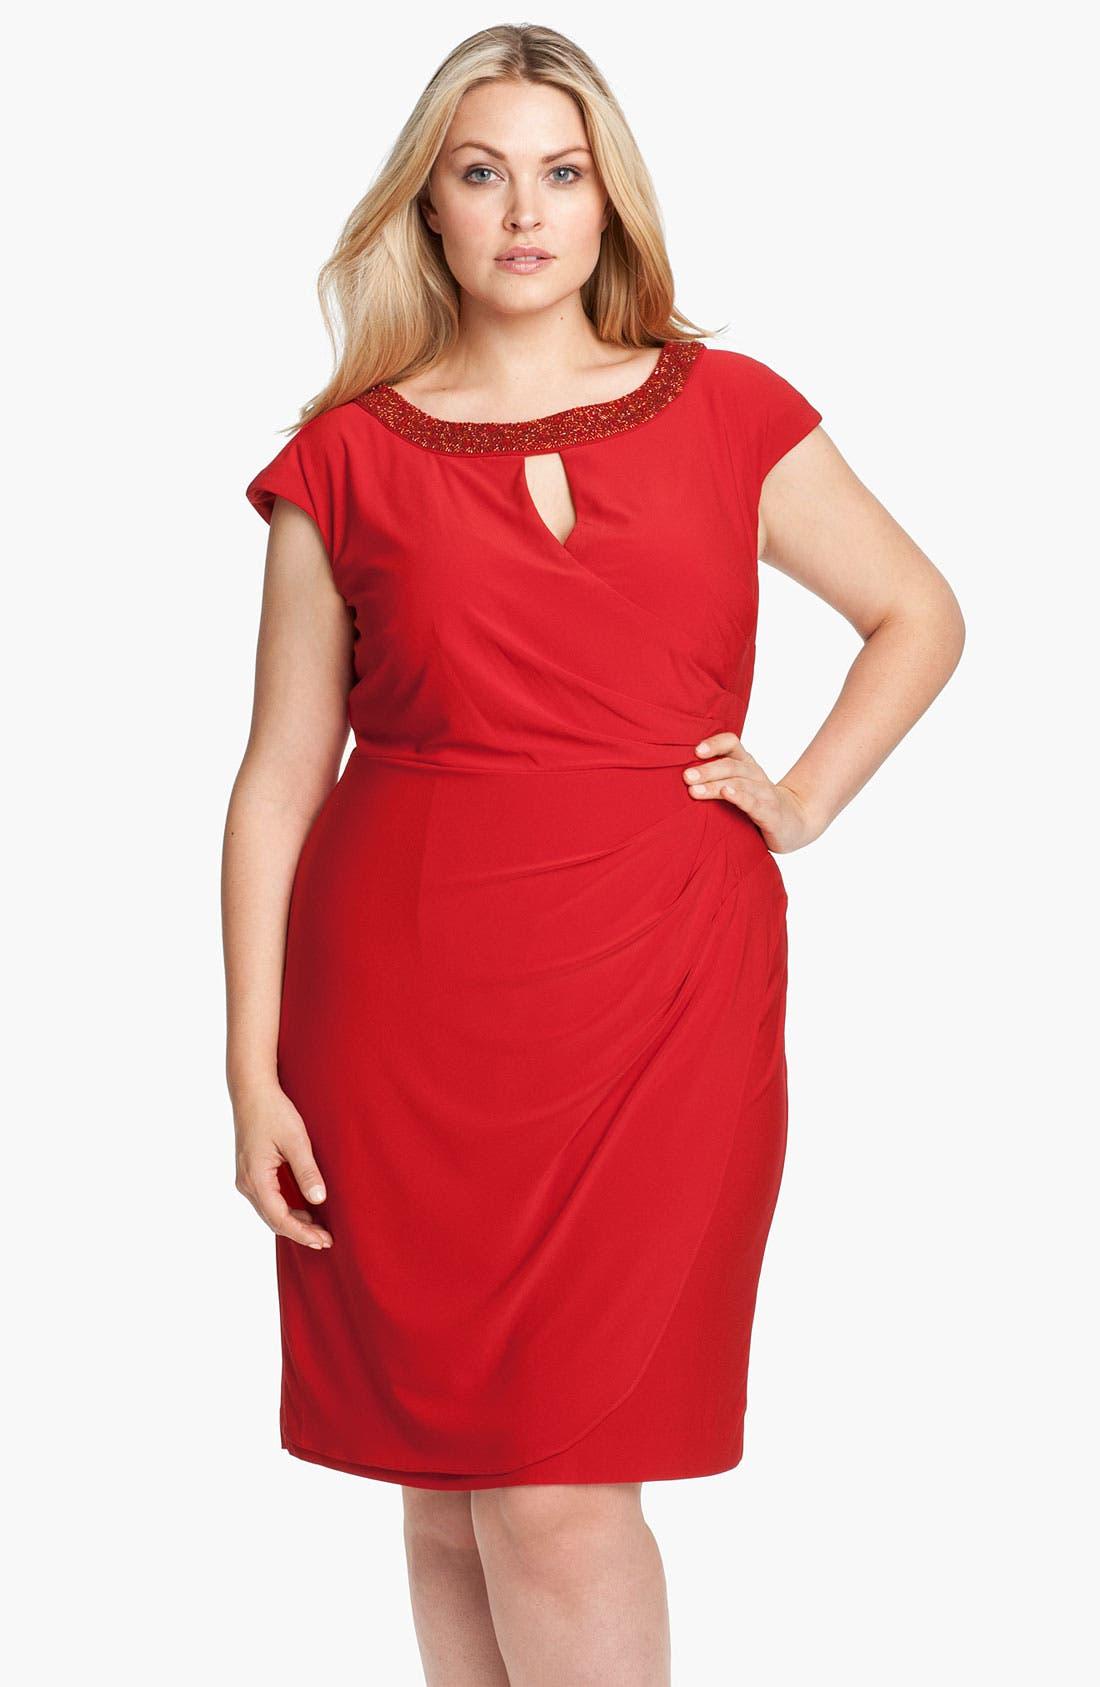 Alternate Image 1 Selected - Alex Evenings Beaded Matte Jersey Sheath Dress (Plus Size)